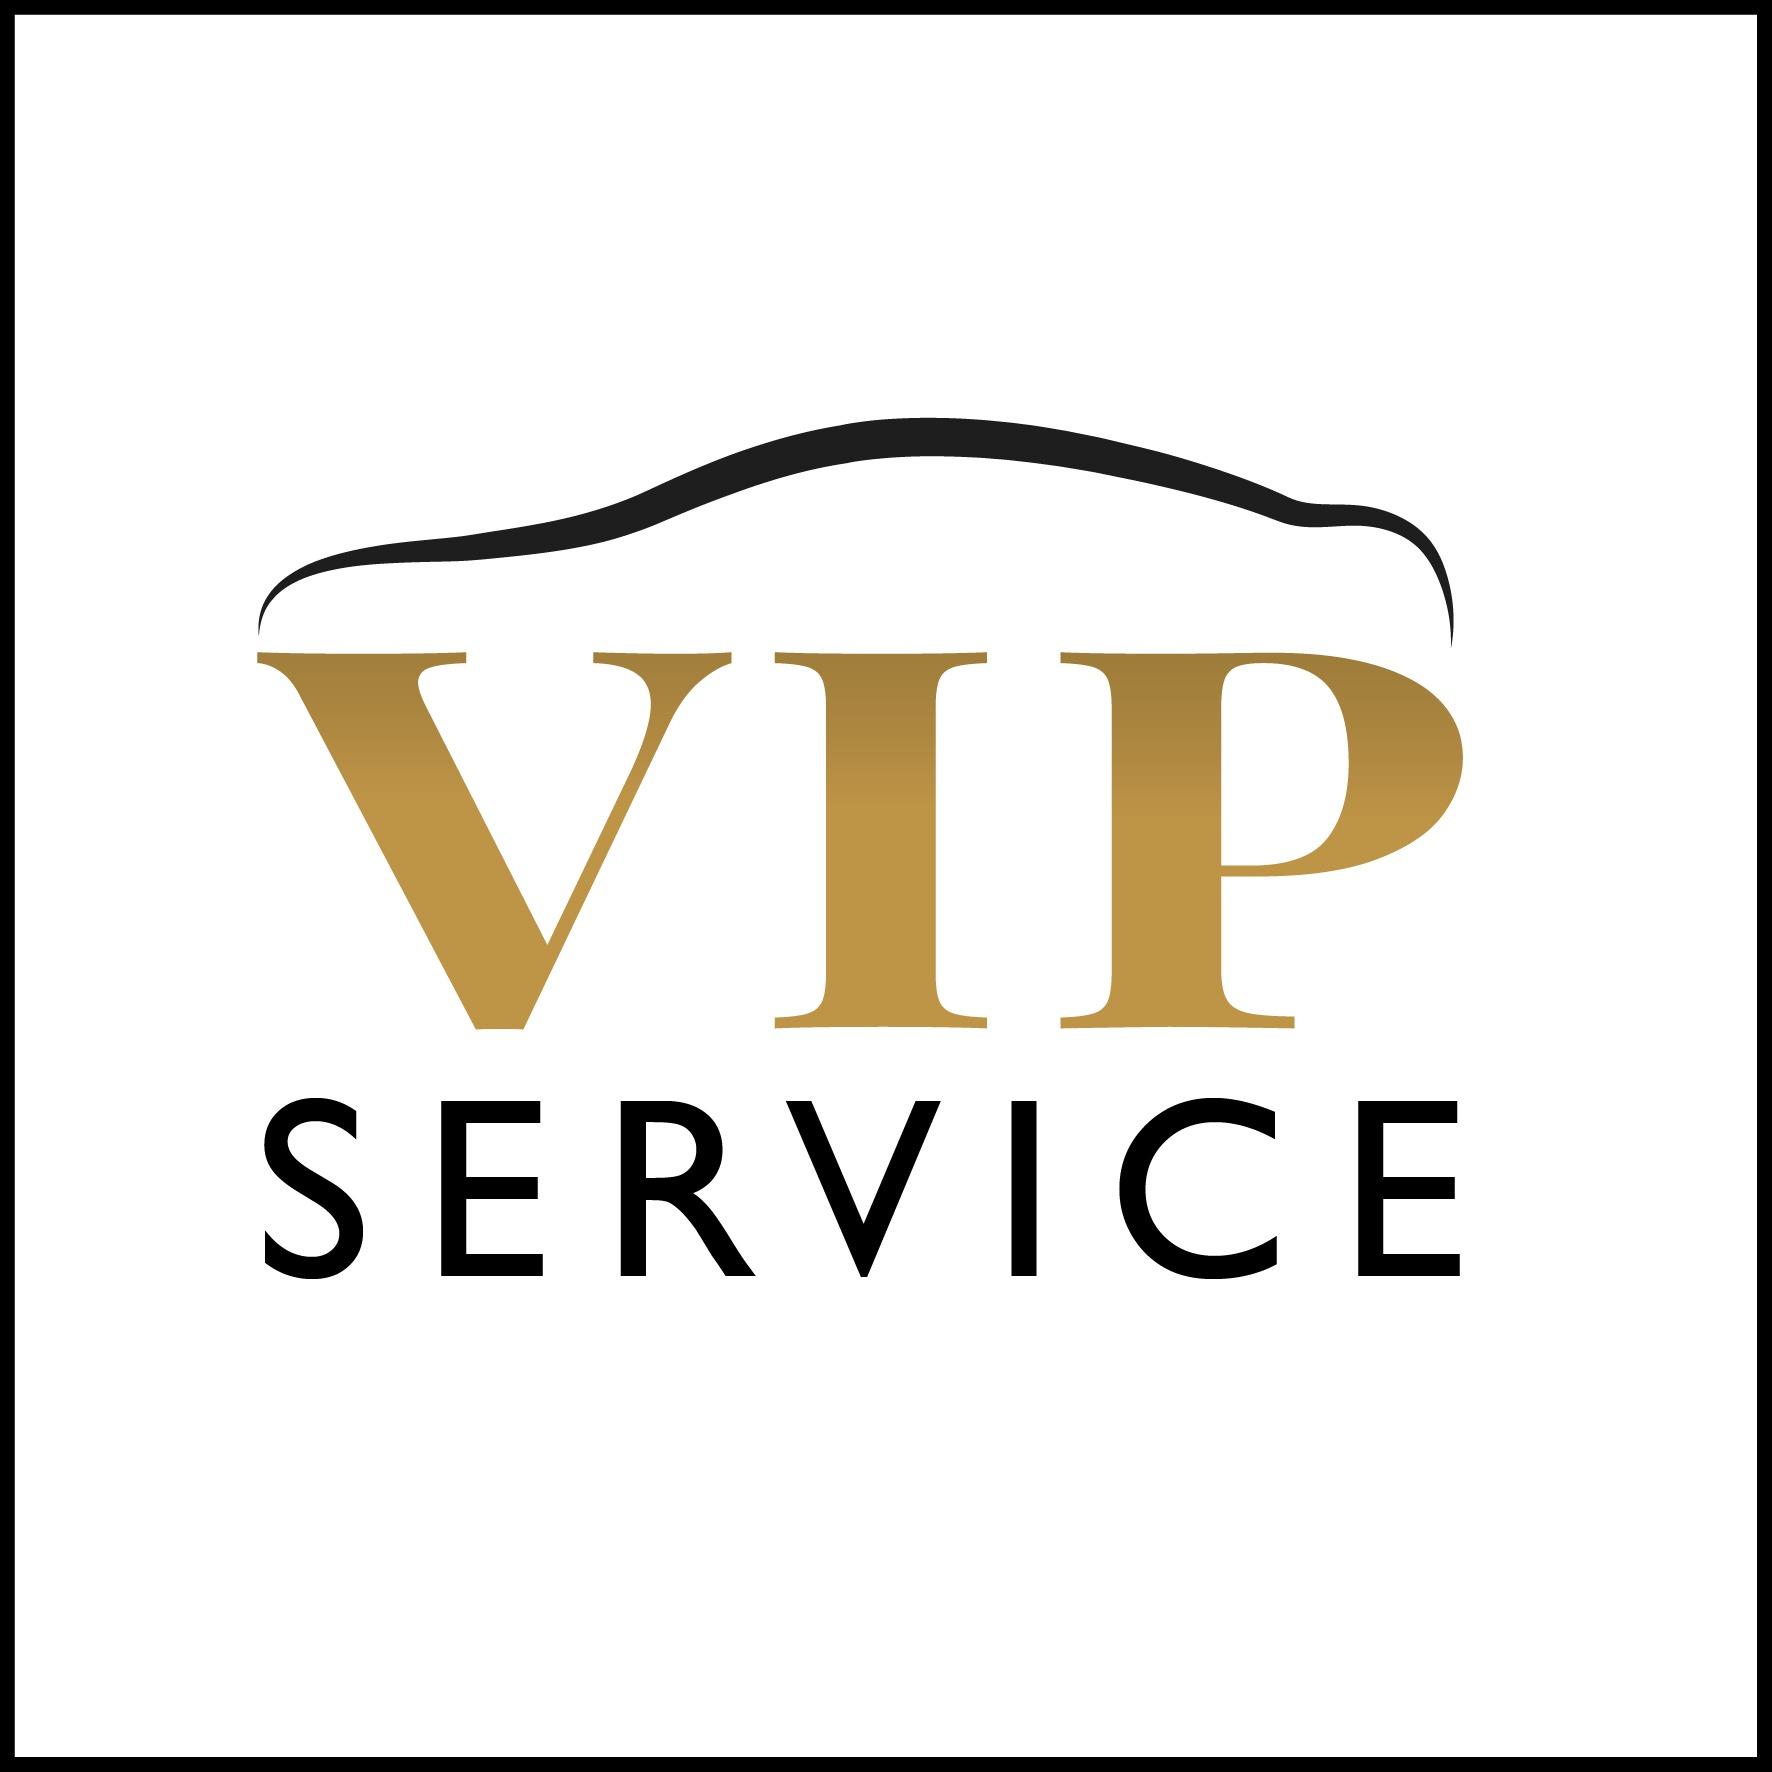 logo-vip-default-01